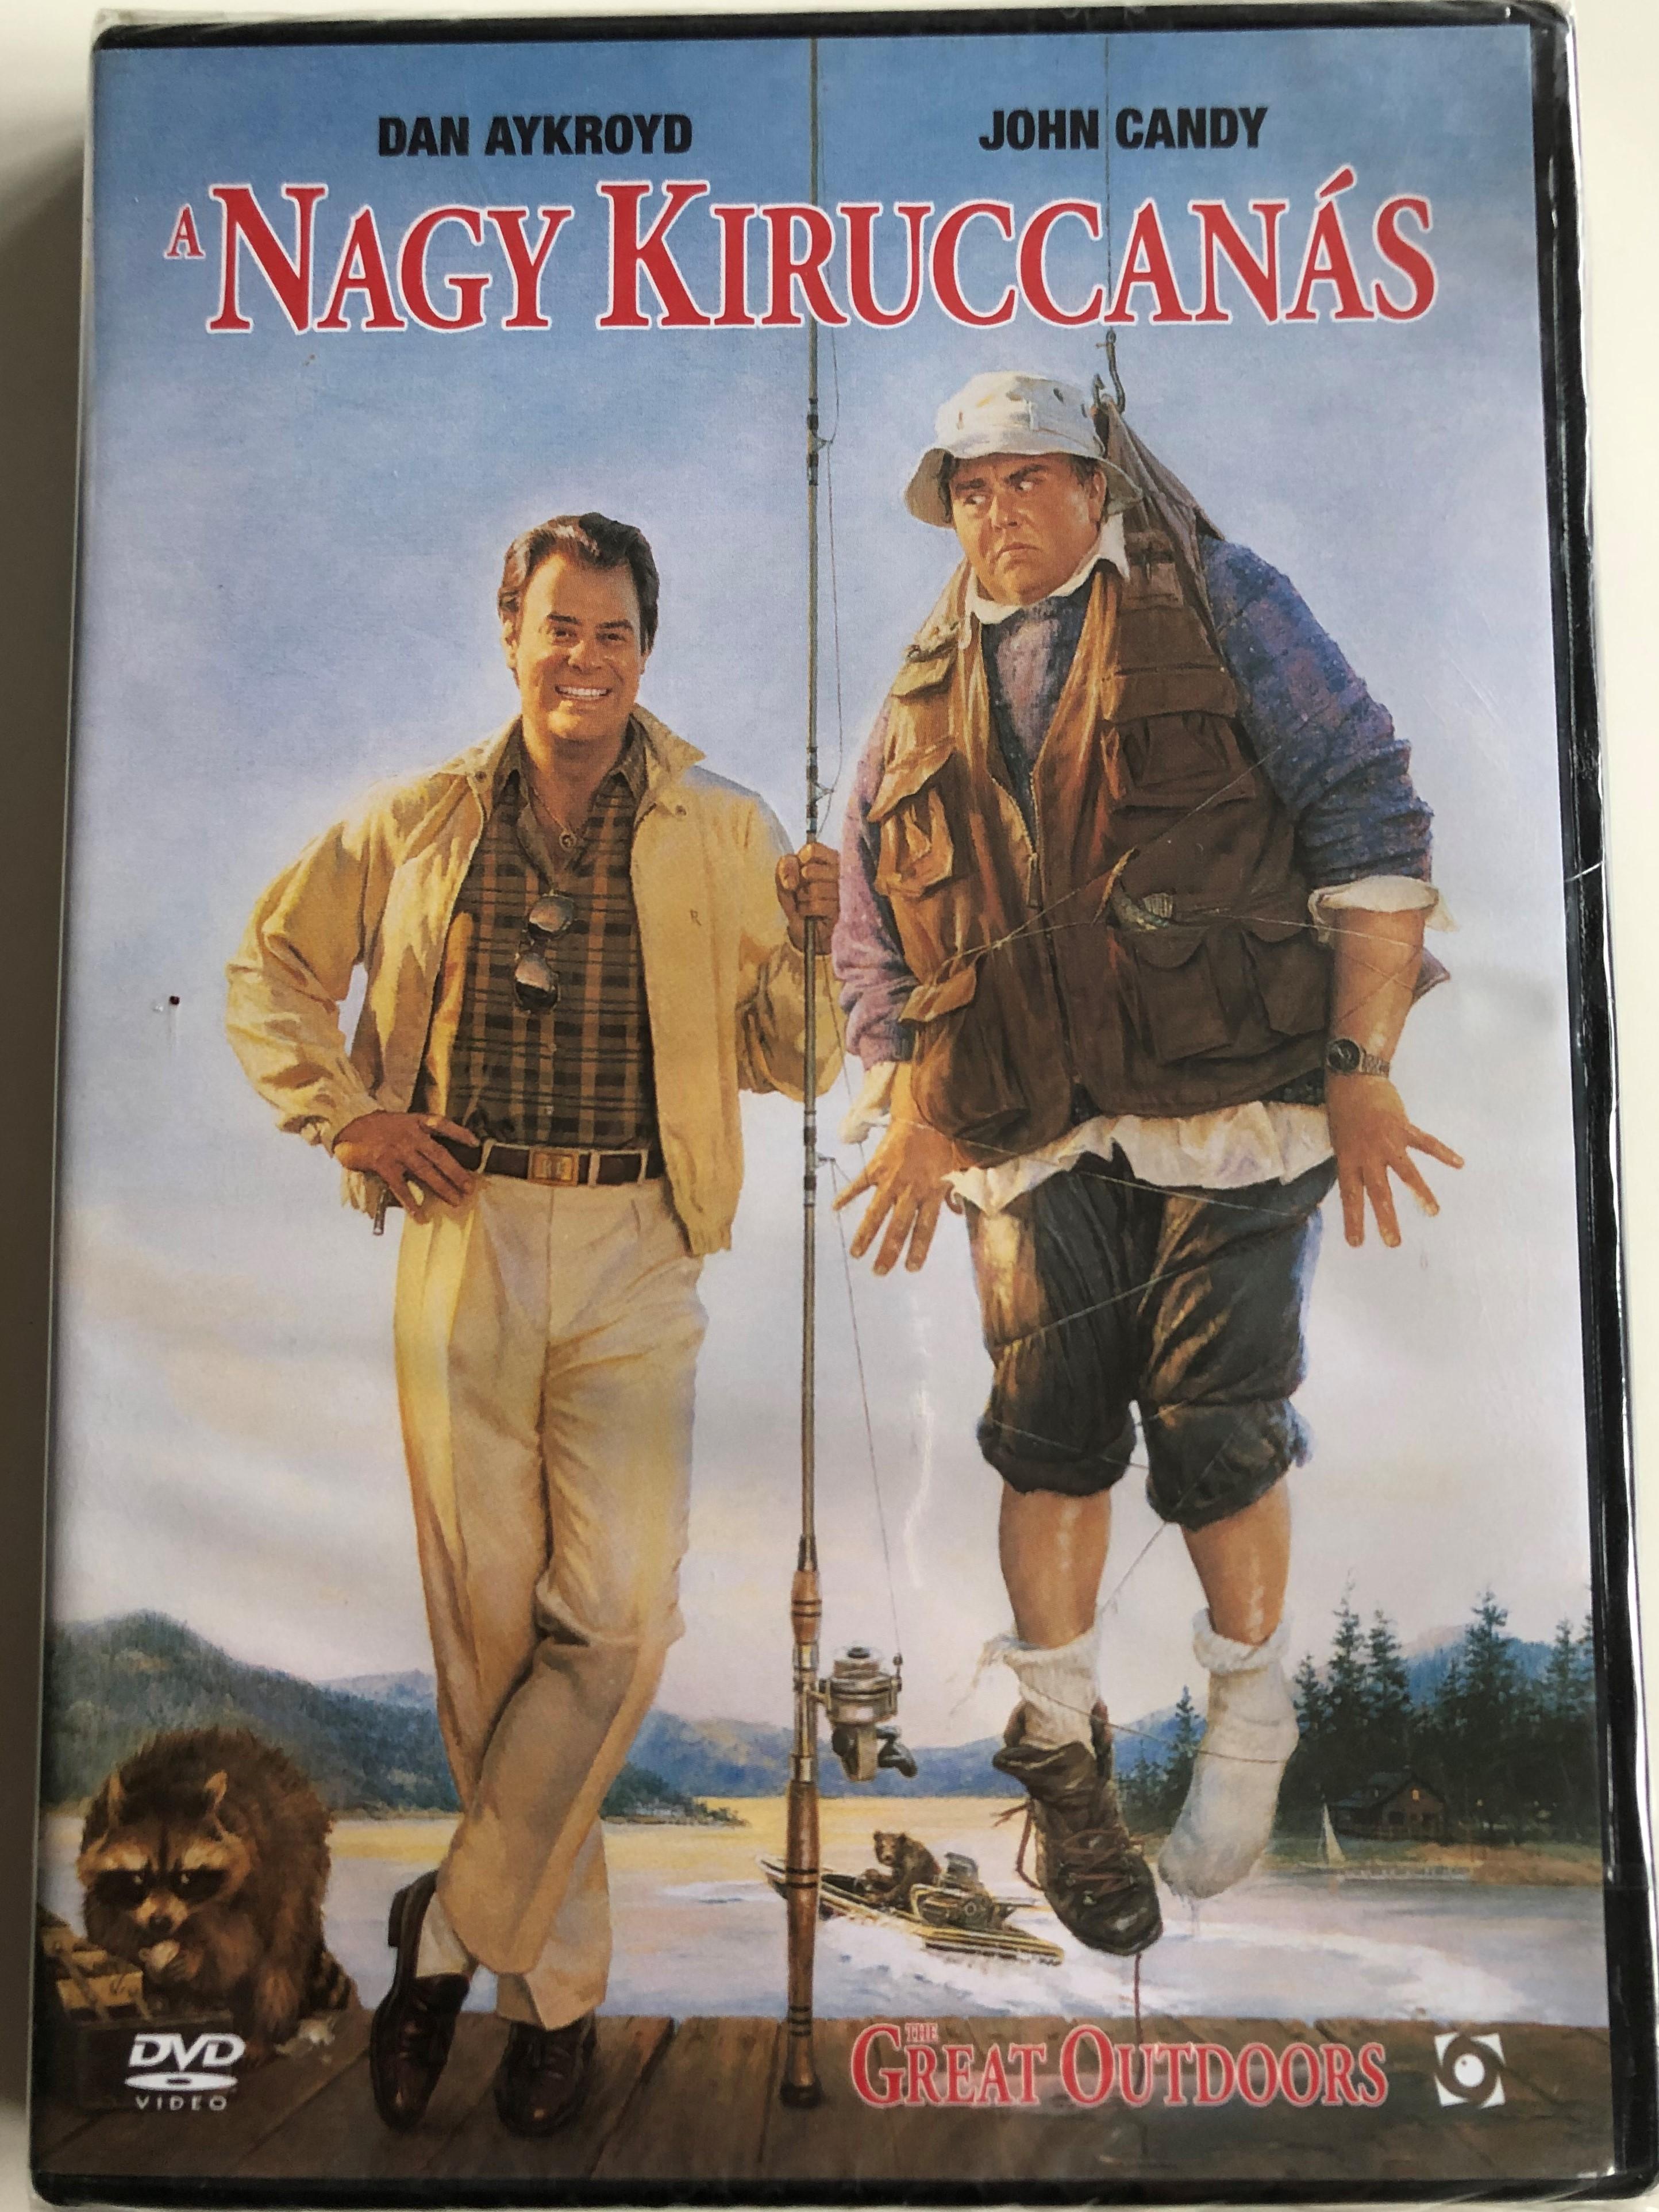 the-great-outdoors-dvd-1988-a-nagy-kiruccan-s-1.jpg